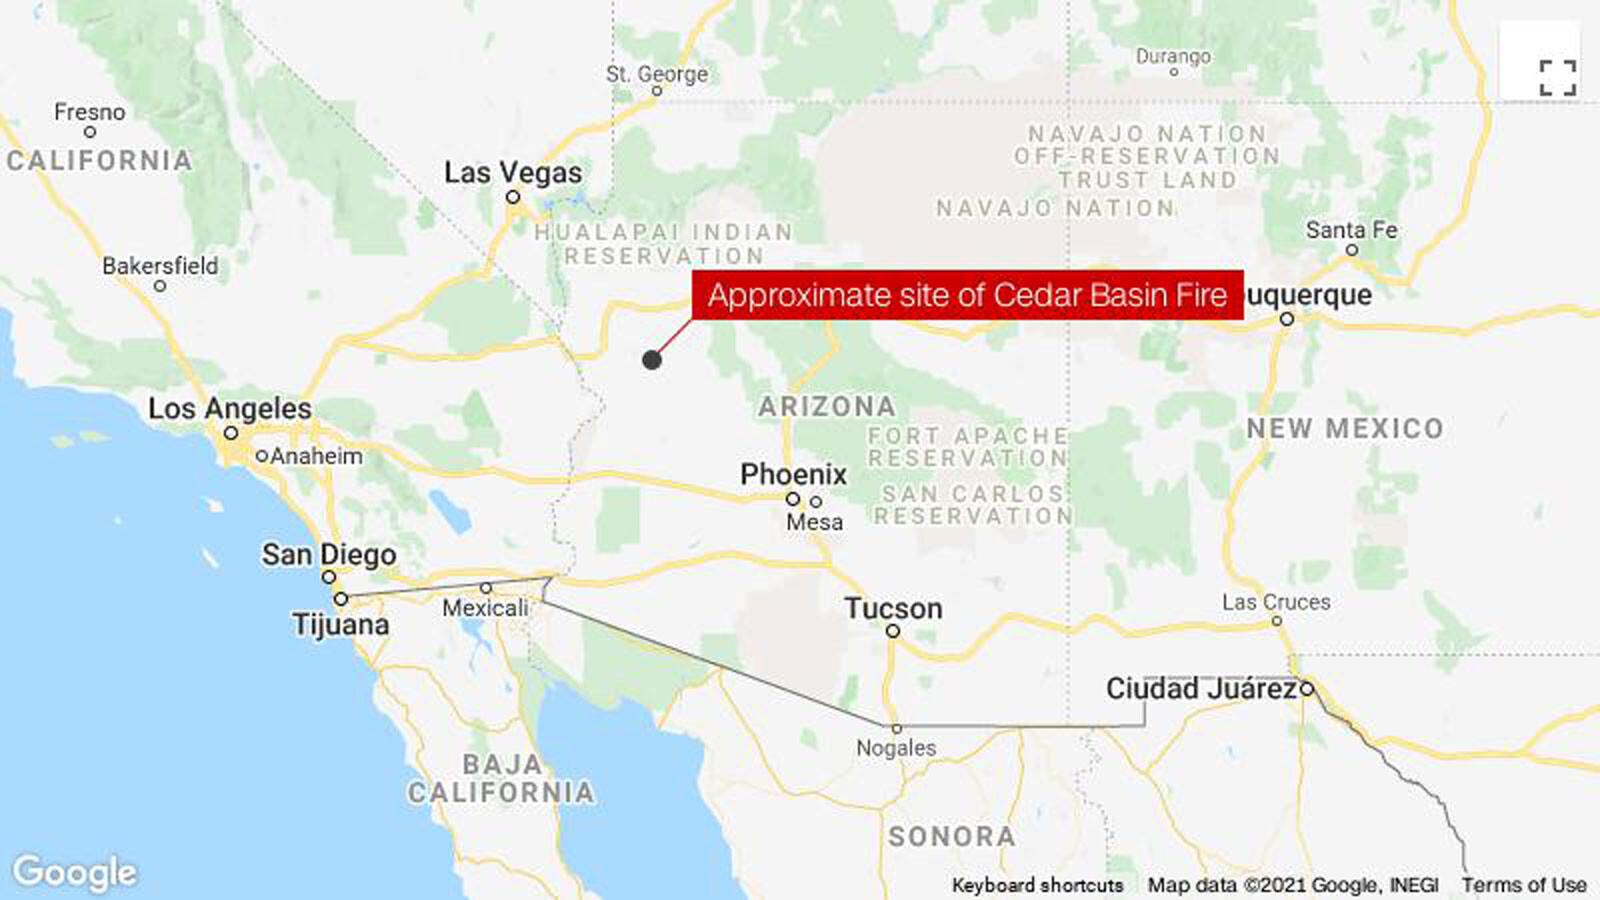 2 crew members killed while helping fight the Cedar Basin wildfire in Arizona